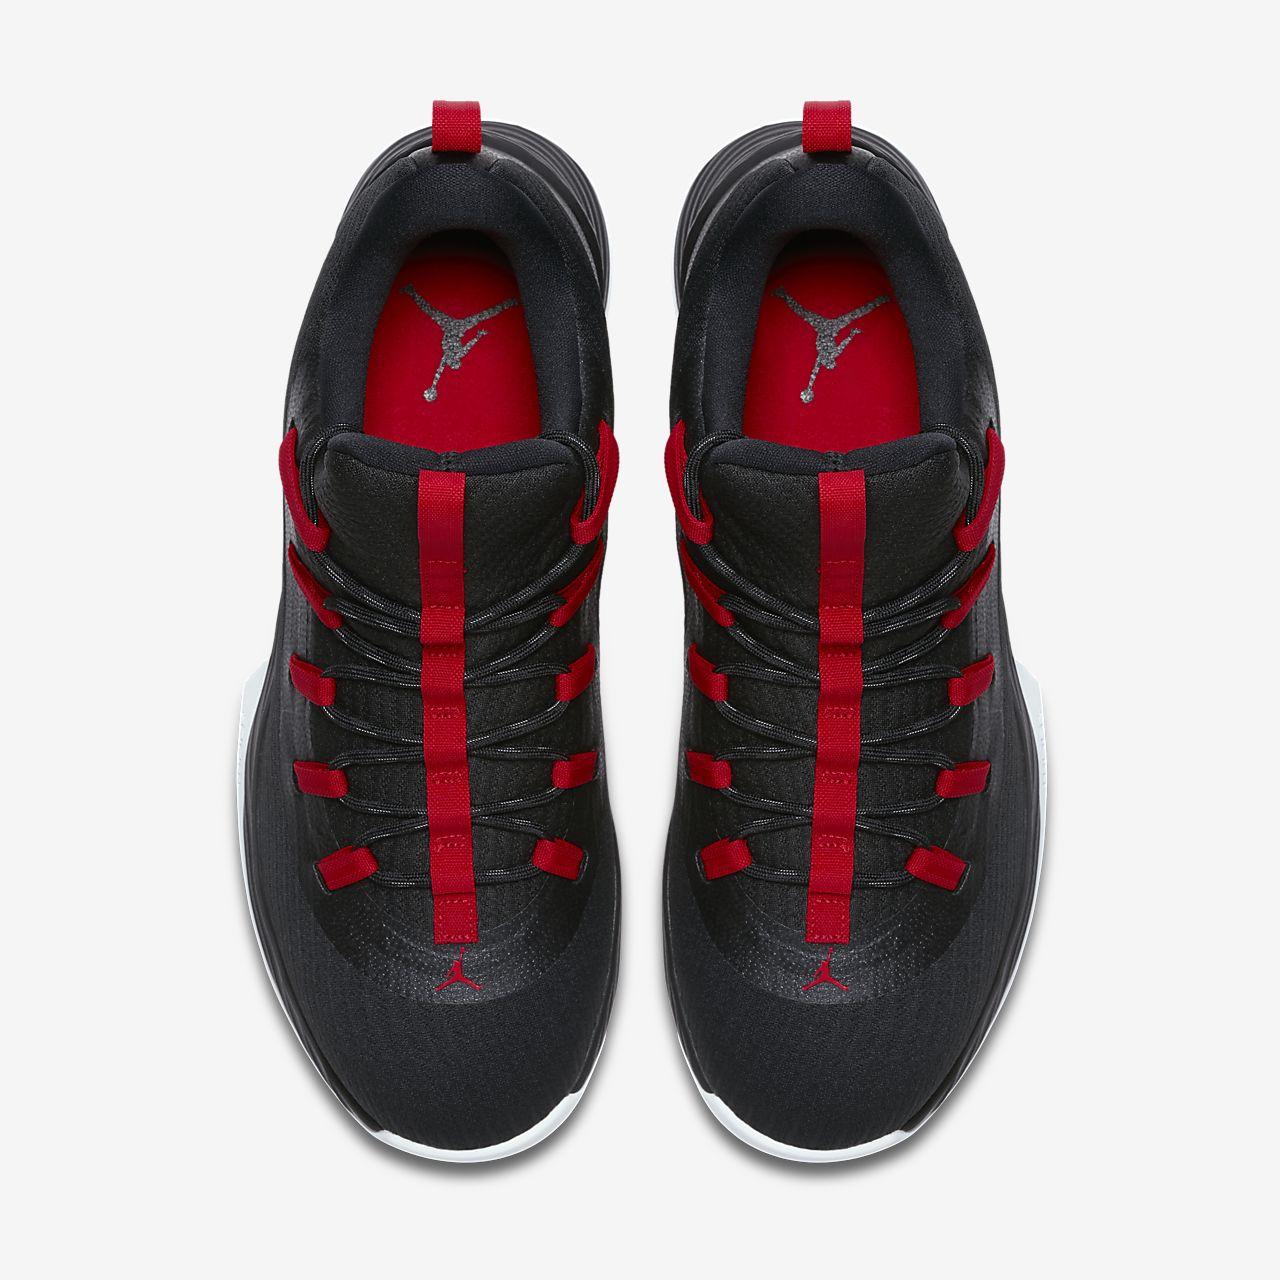 premium selection ef280 f606f 52424 11305; discount code for jordan ultra fly 2 low zapatillas de  baloncesto hombre 24798 898fc